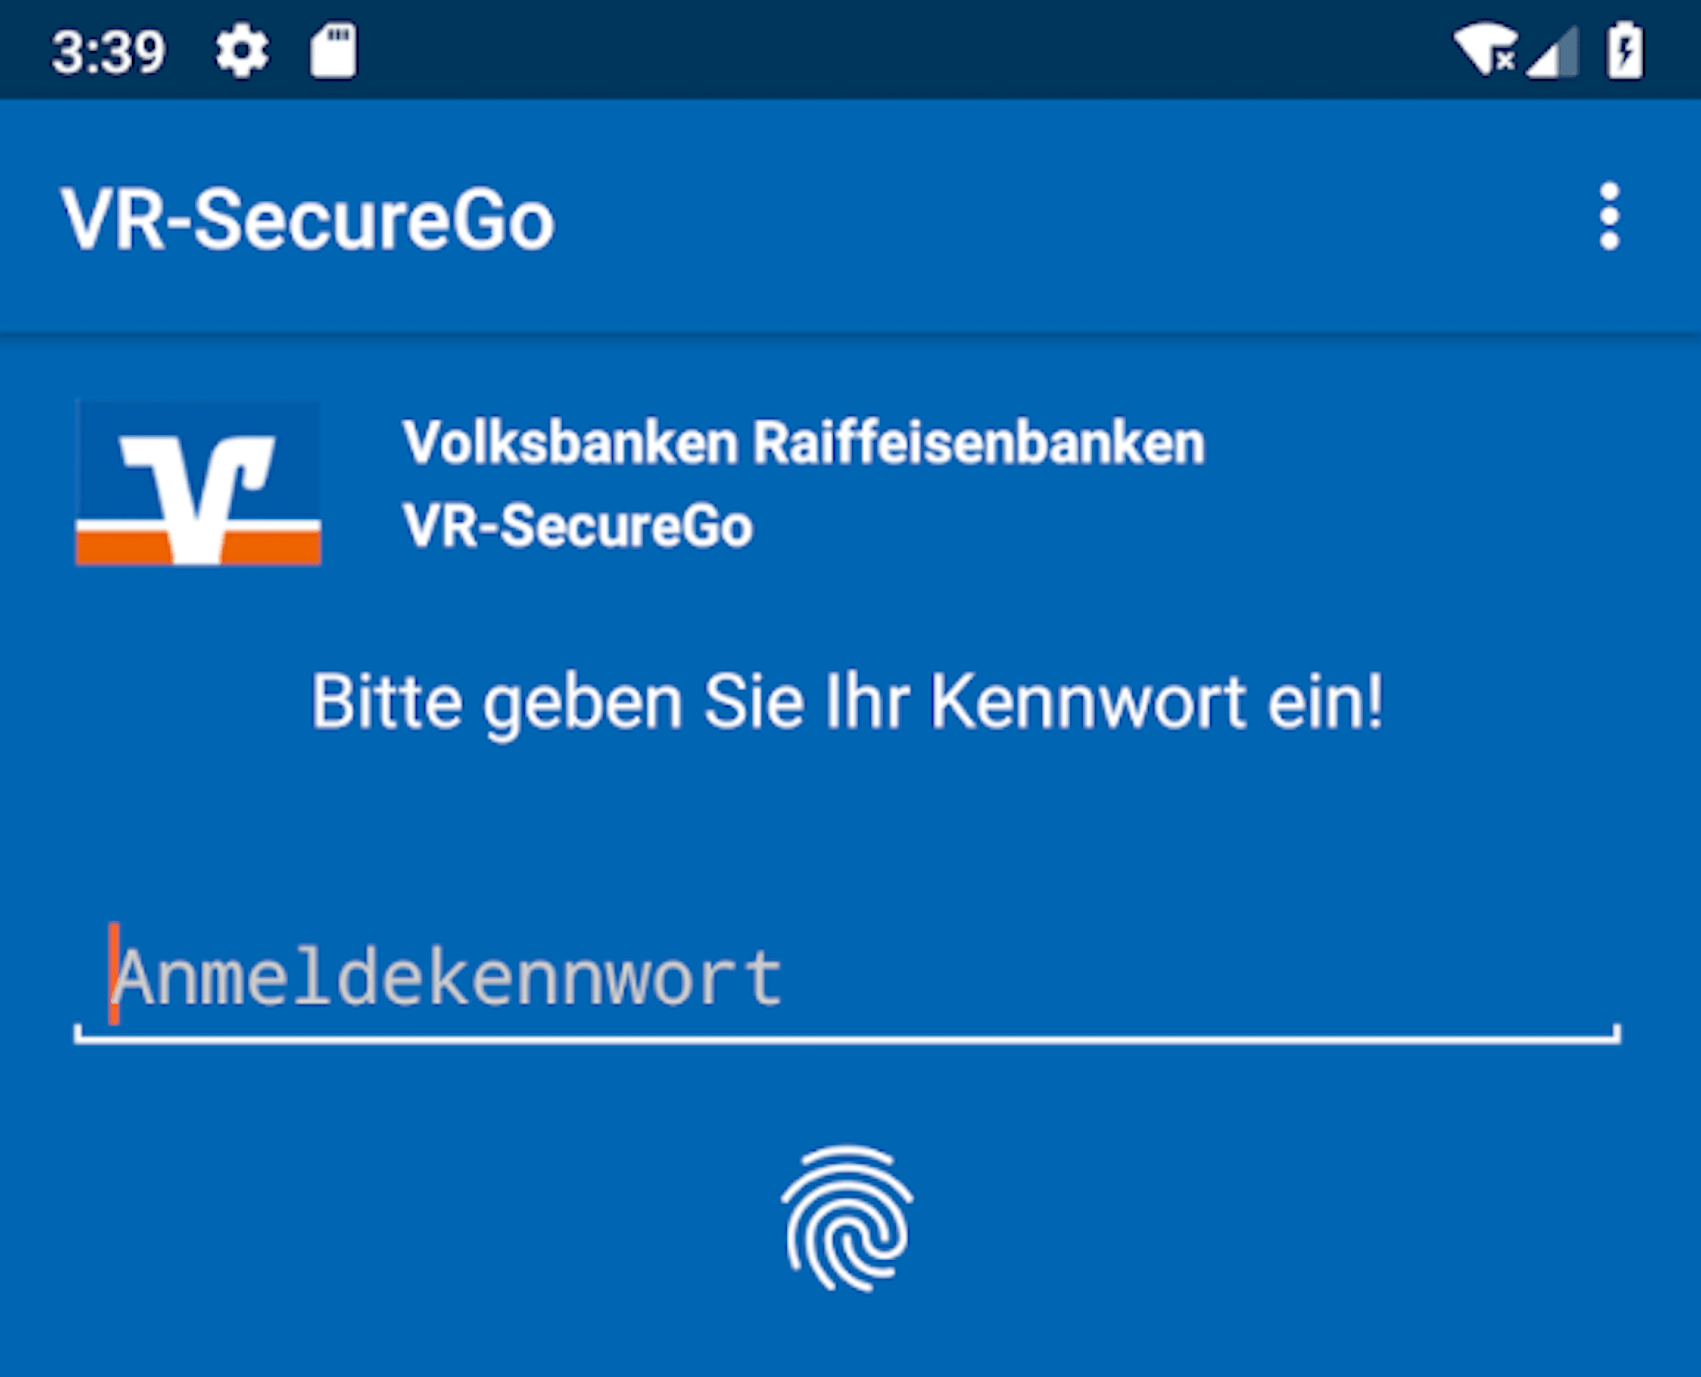 VR SecureGo überzeugt nicht (Foto: VR Banken im Google Play Store)